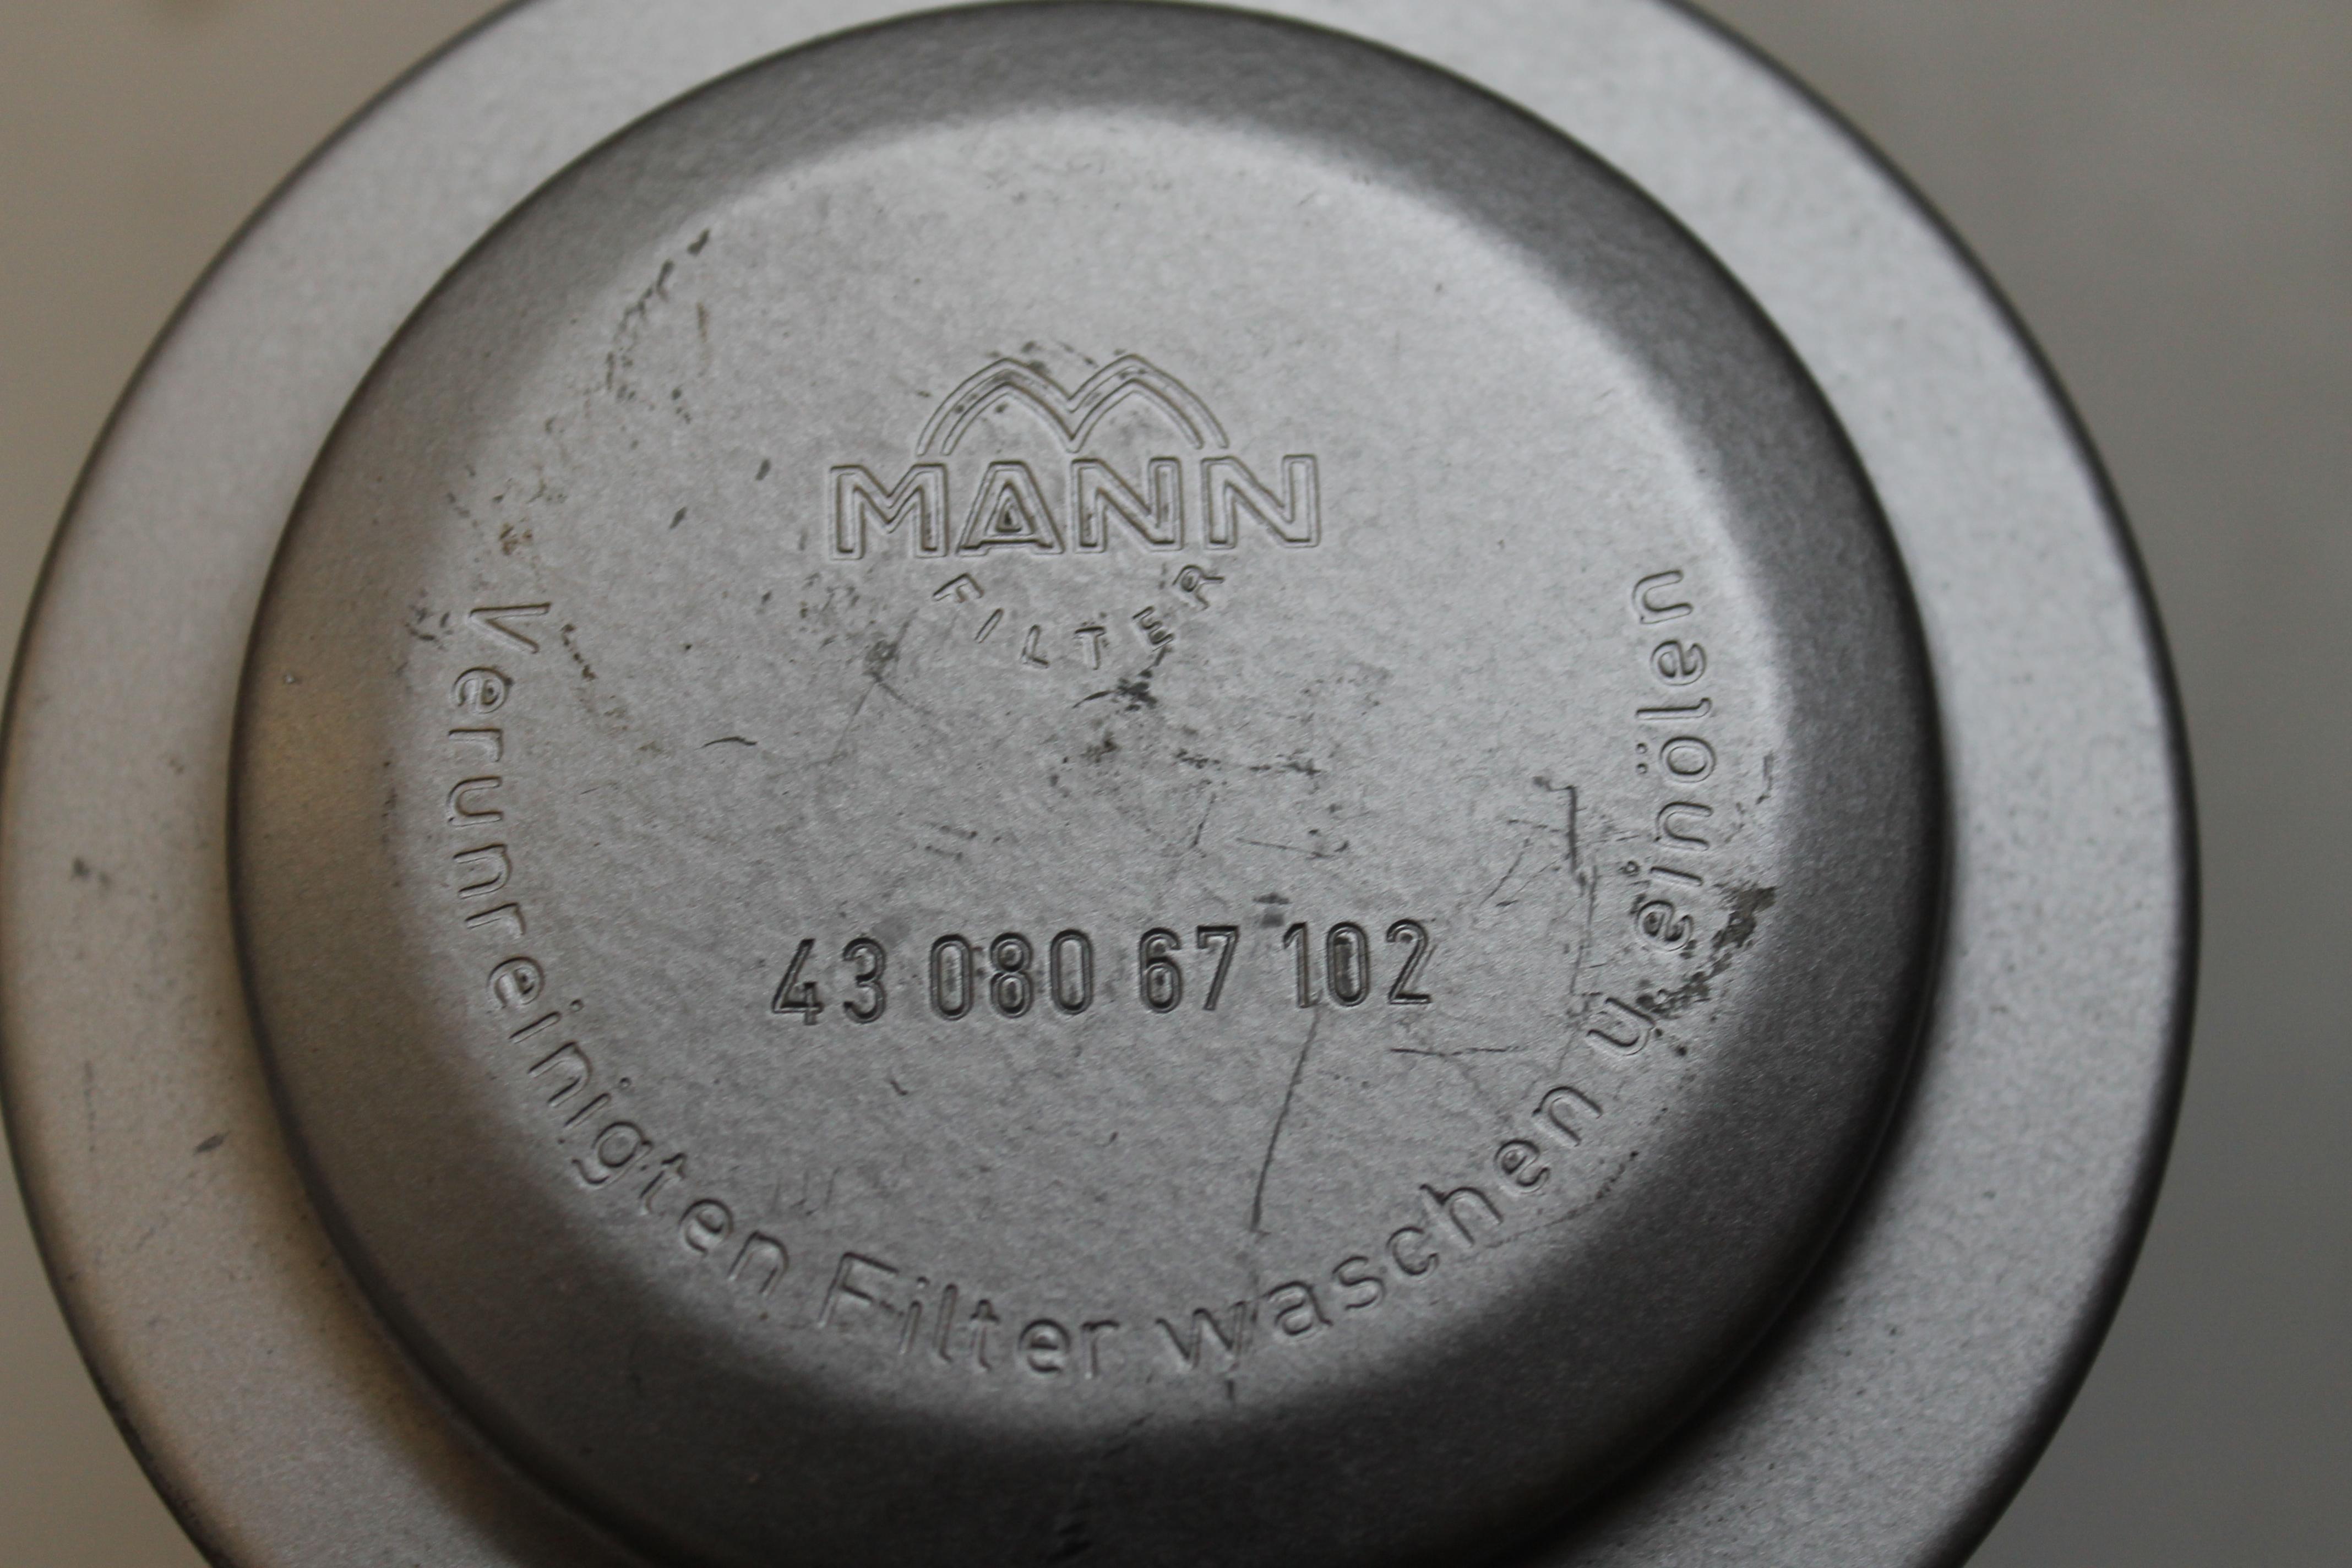 MANN Luftfilter 43 080 67 102